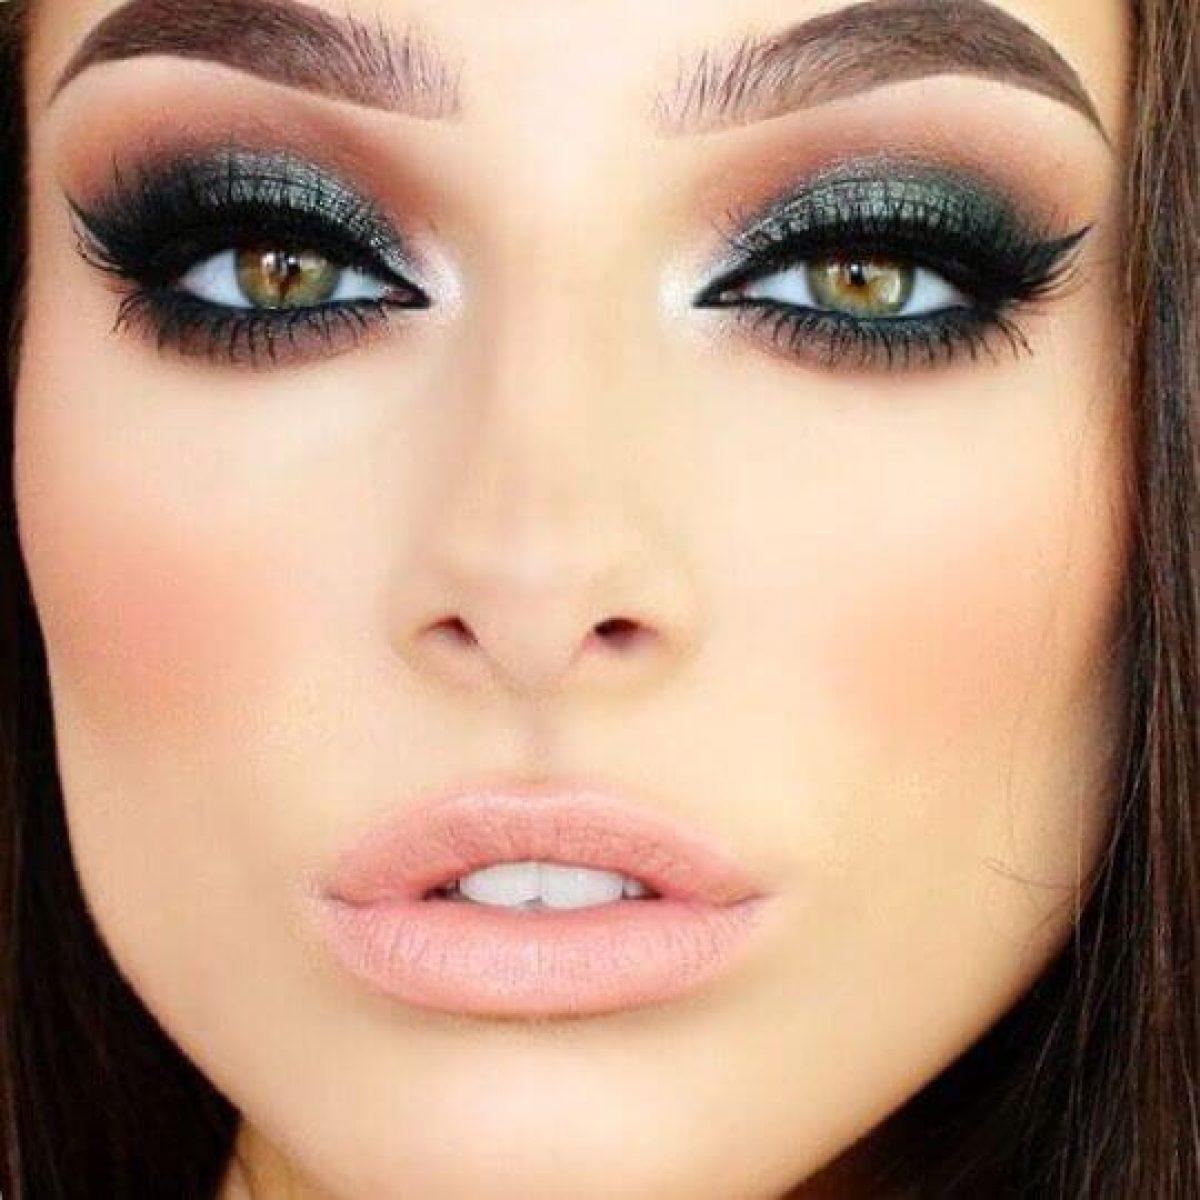 Green-black-smokey-eyes.-3 60+ Hottest Smokey Eye Makeup Looks in 2020